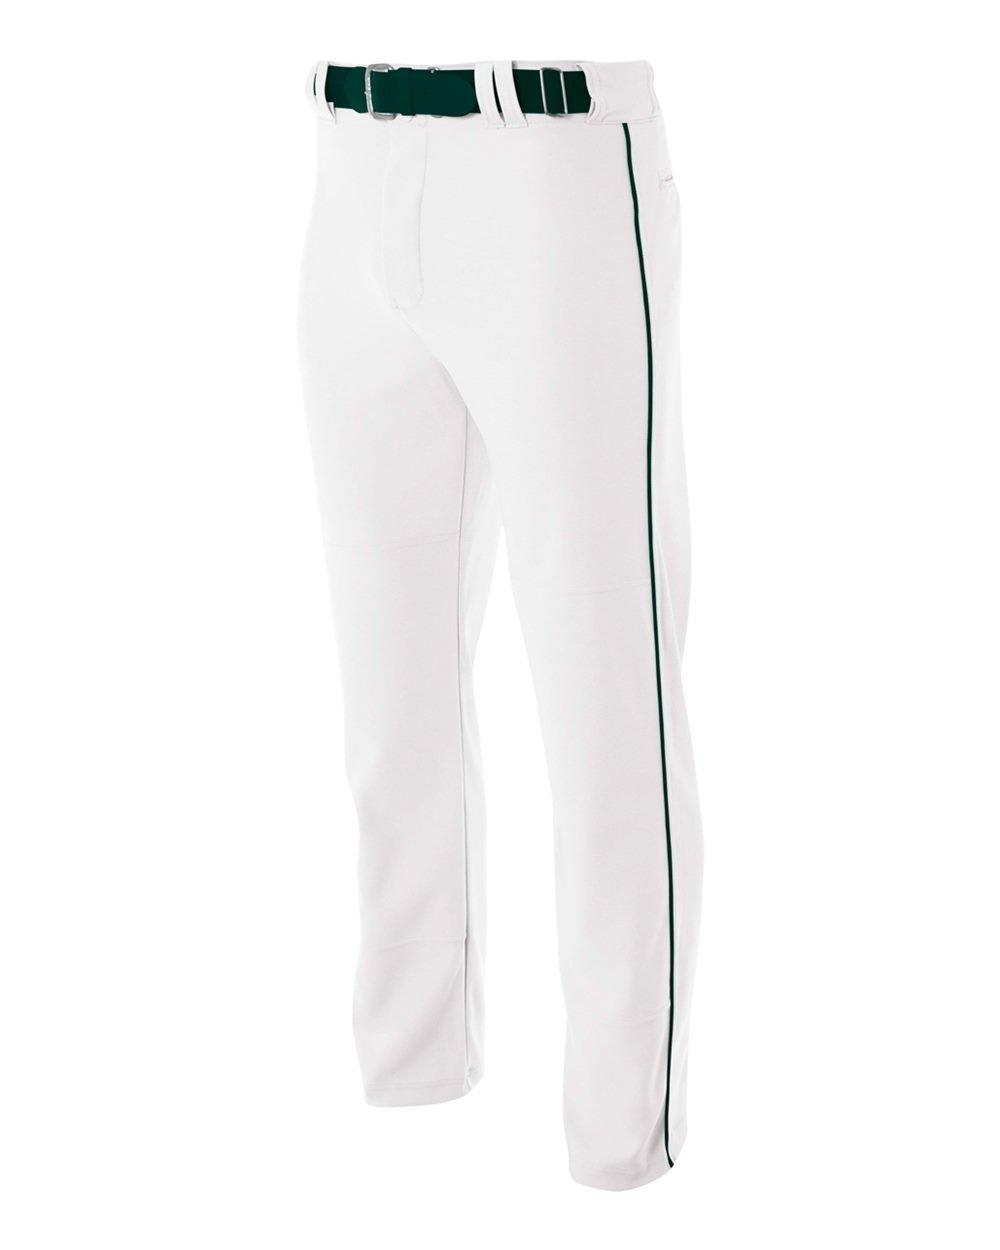 A4 NB6162-WHF Pro-Style Open Bottom Baseball Pants, Large by A4